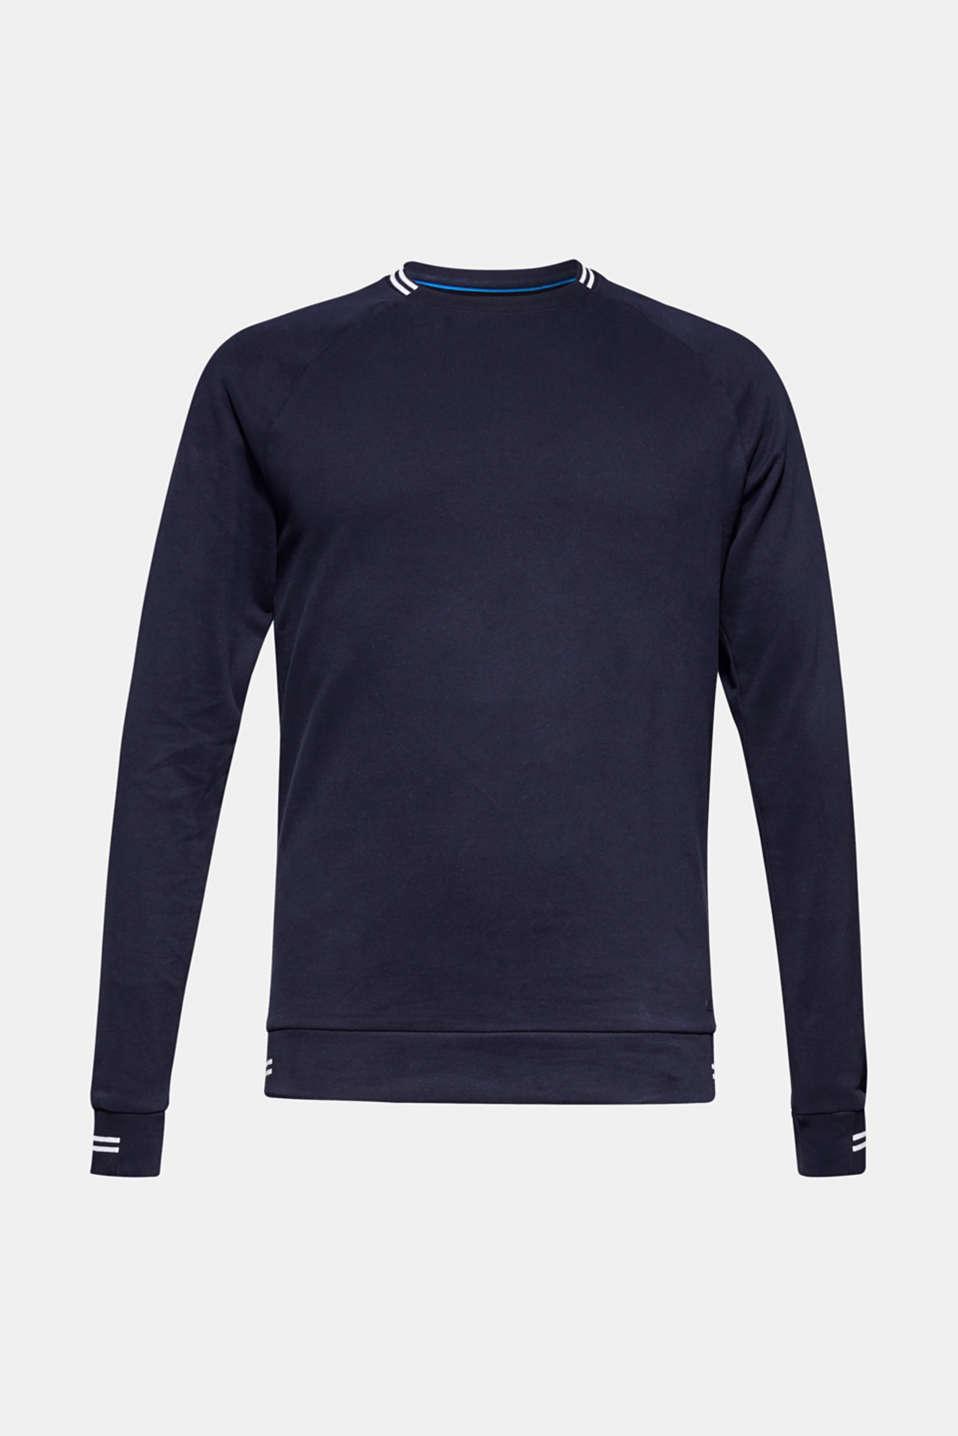 Sweatshirt in 100% cotton, NAVY, detail image number 6